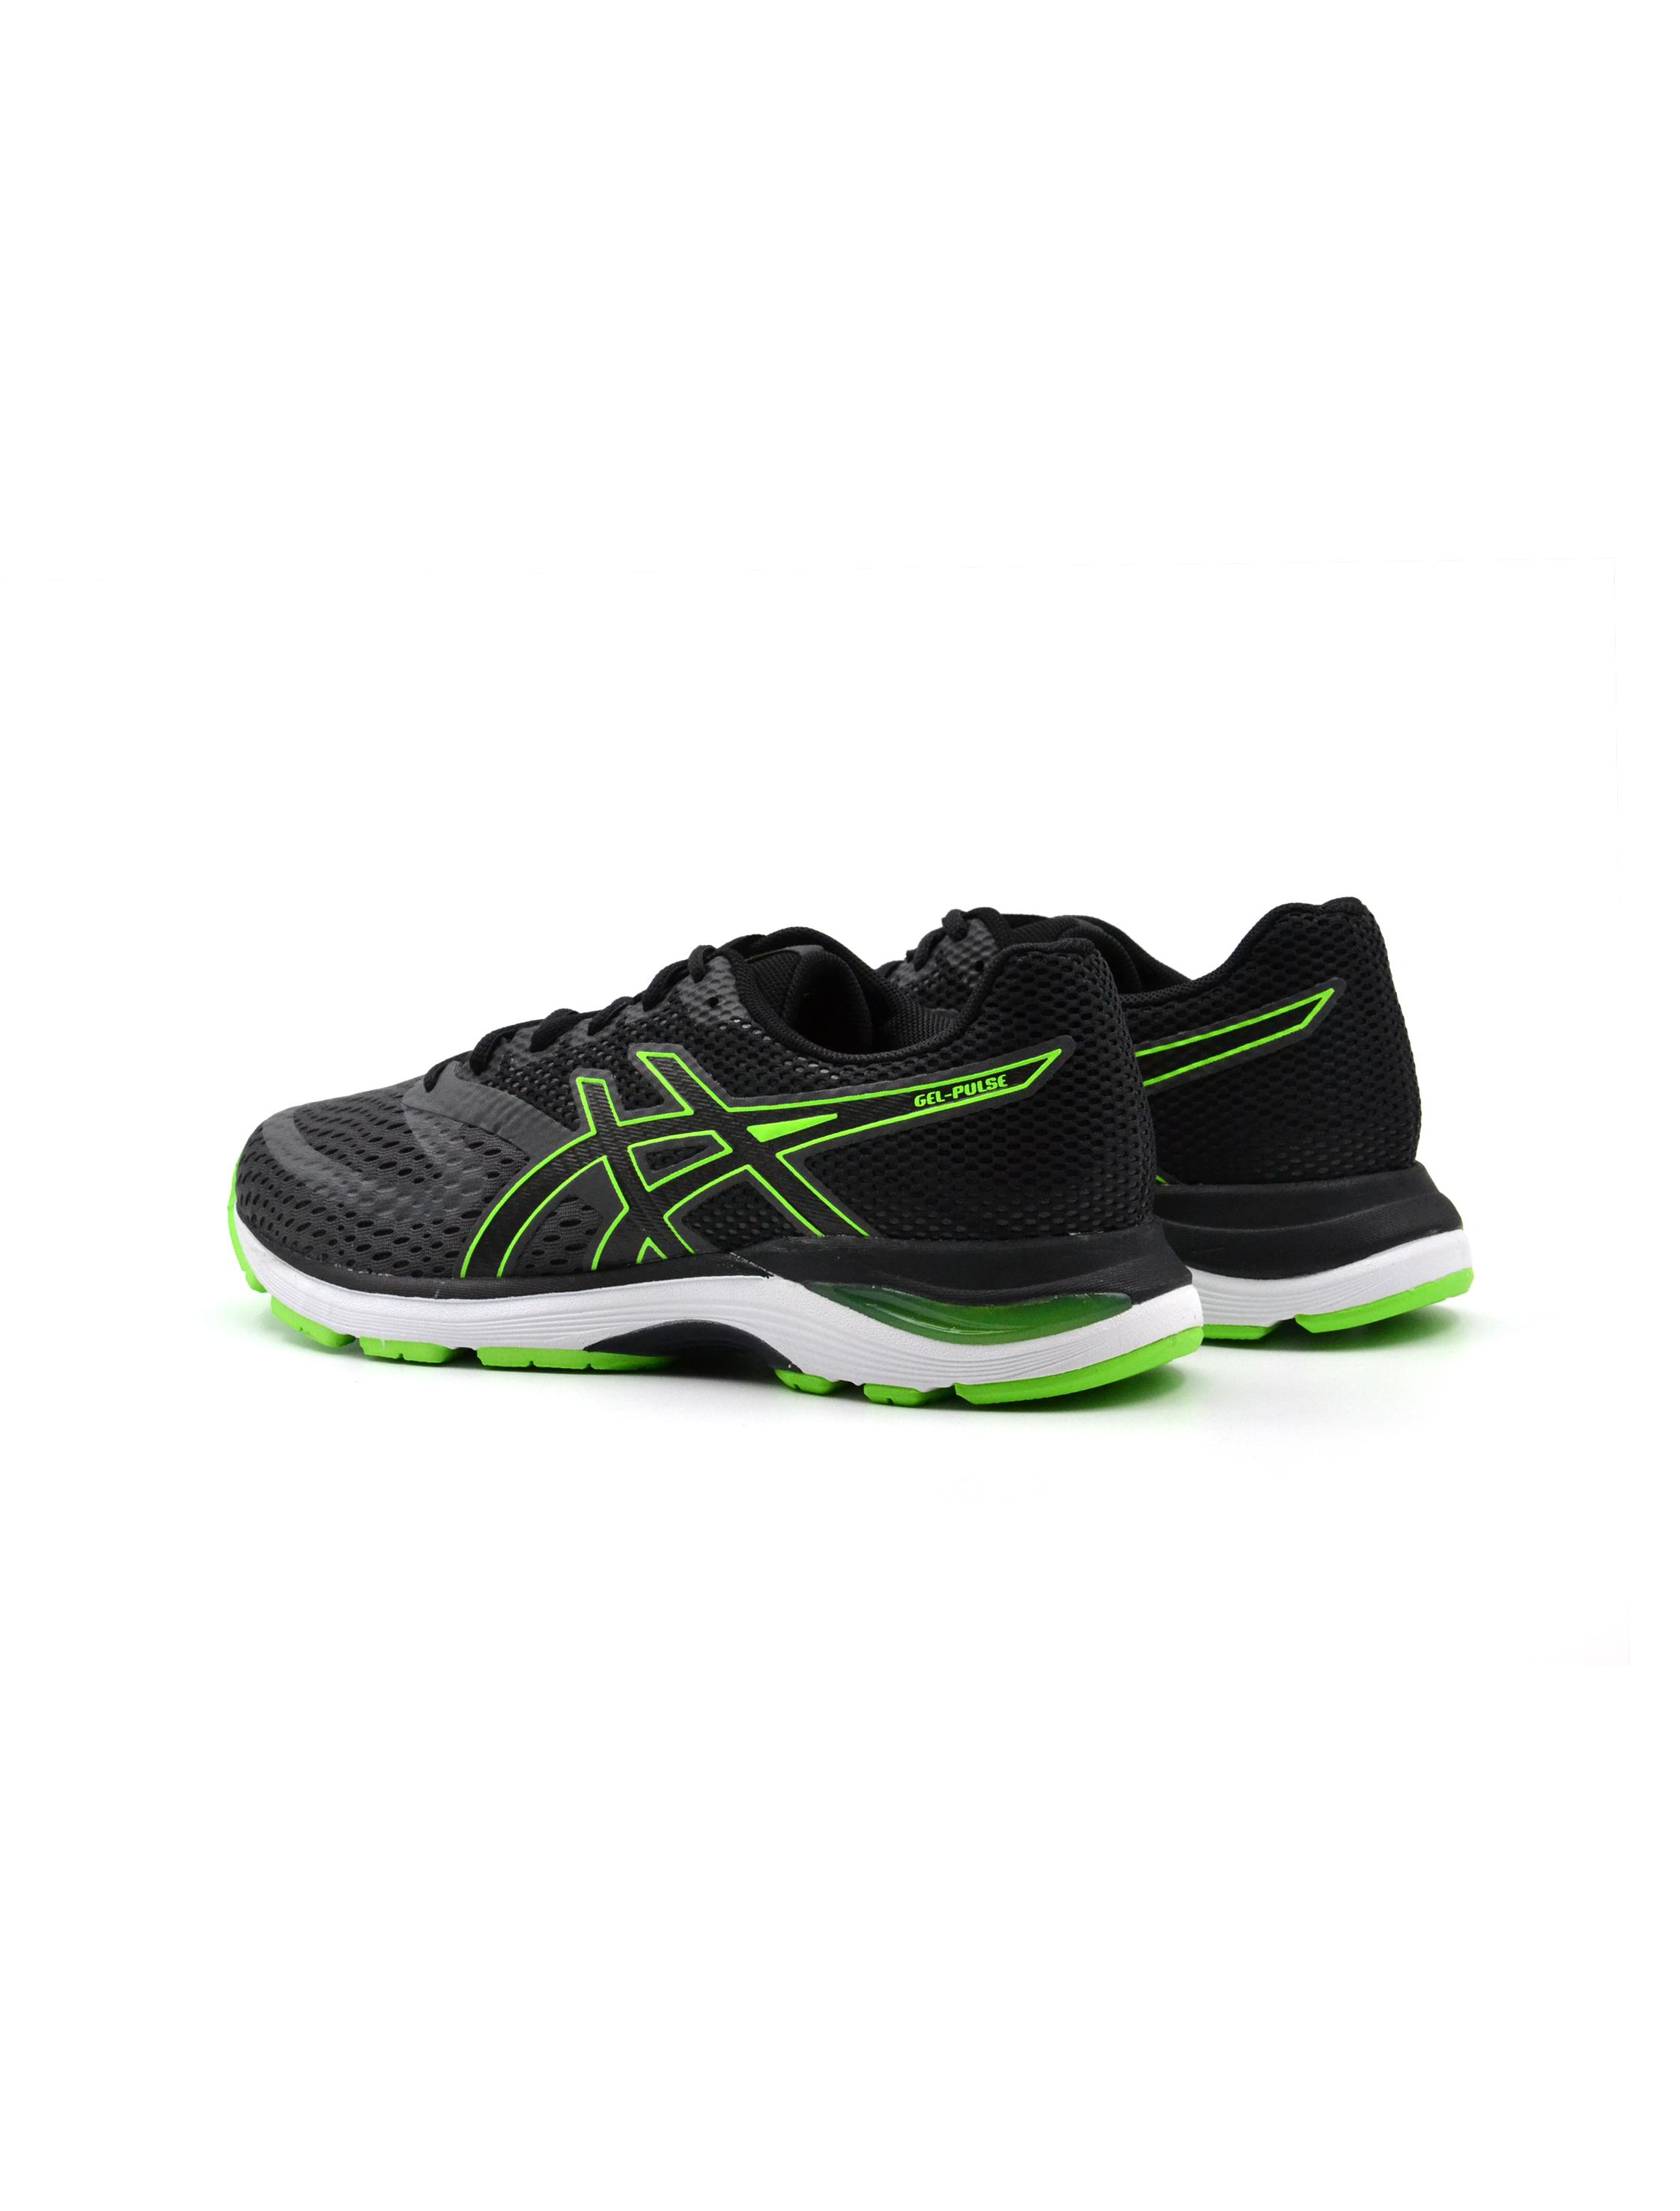 Asics gel pulse 10 sneaker running uomo, Sneakers brand